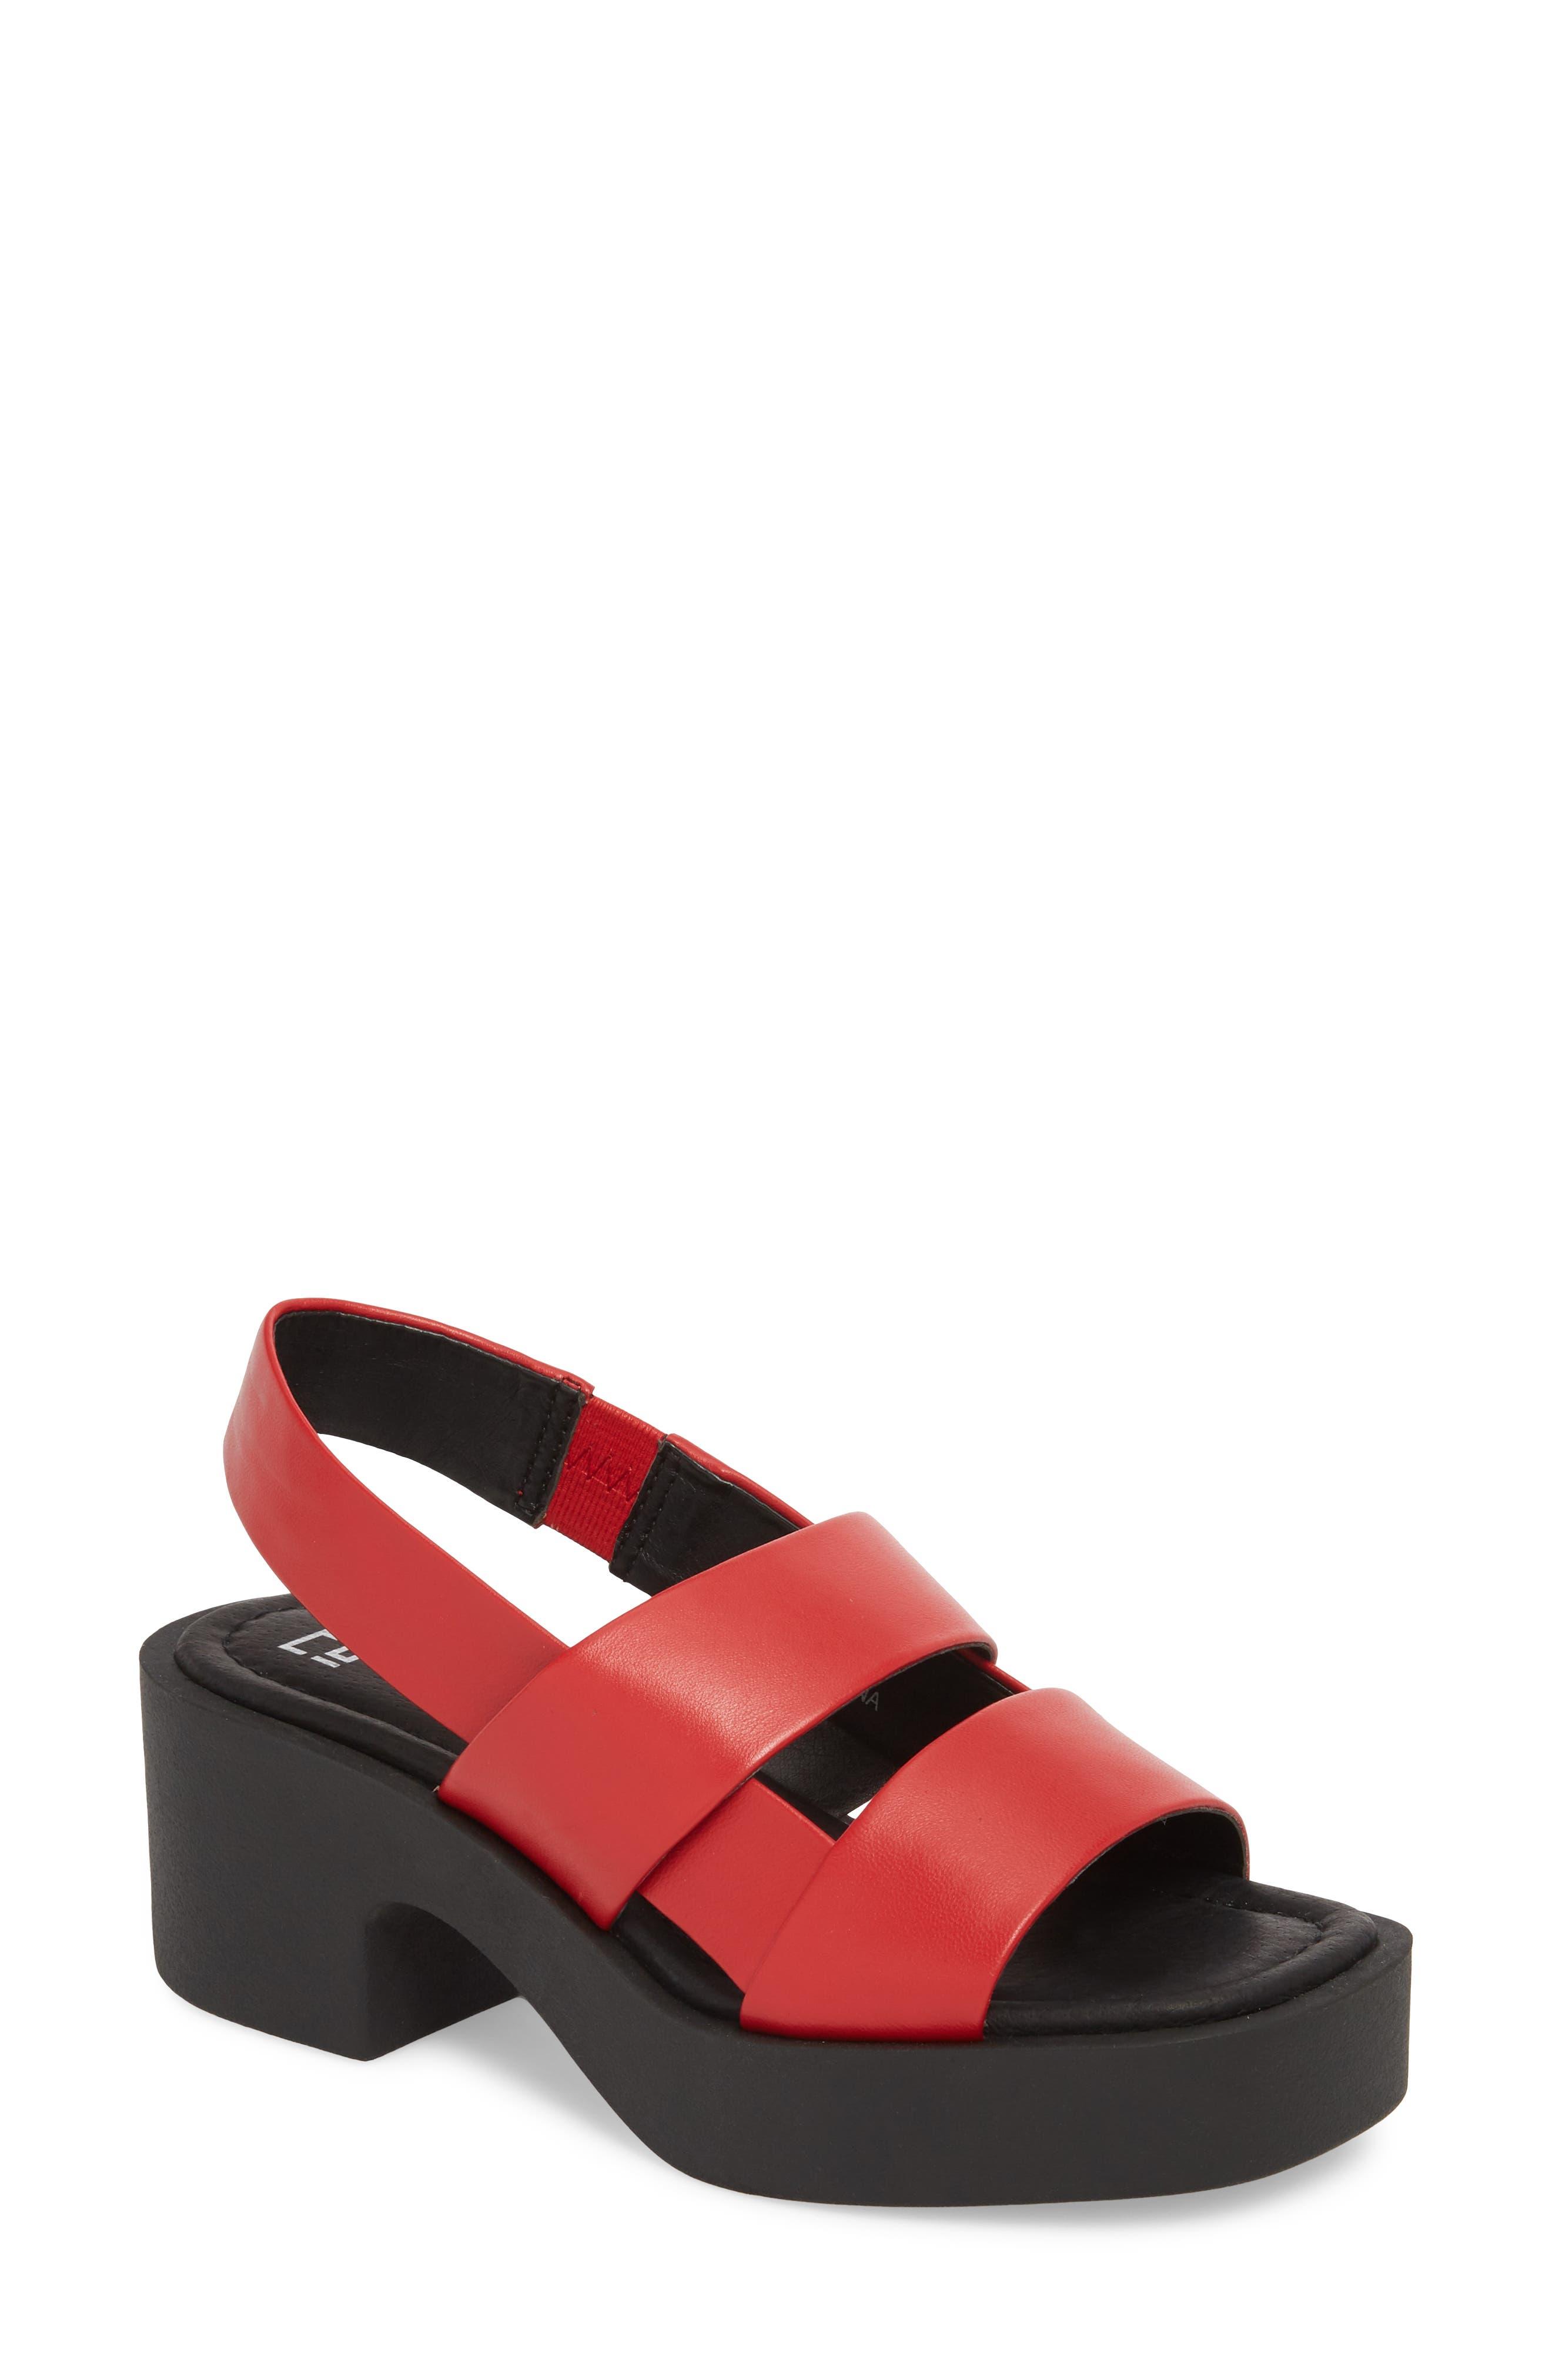 Hazel Slingback Sandal,                             Main thumbnail 1, color,                             Red Leather